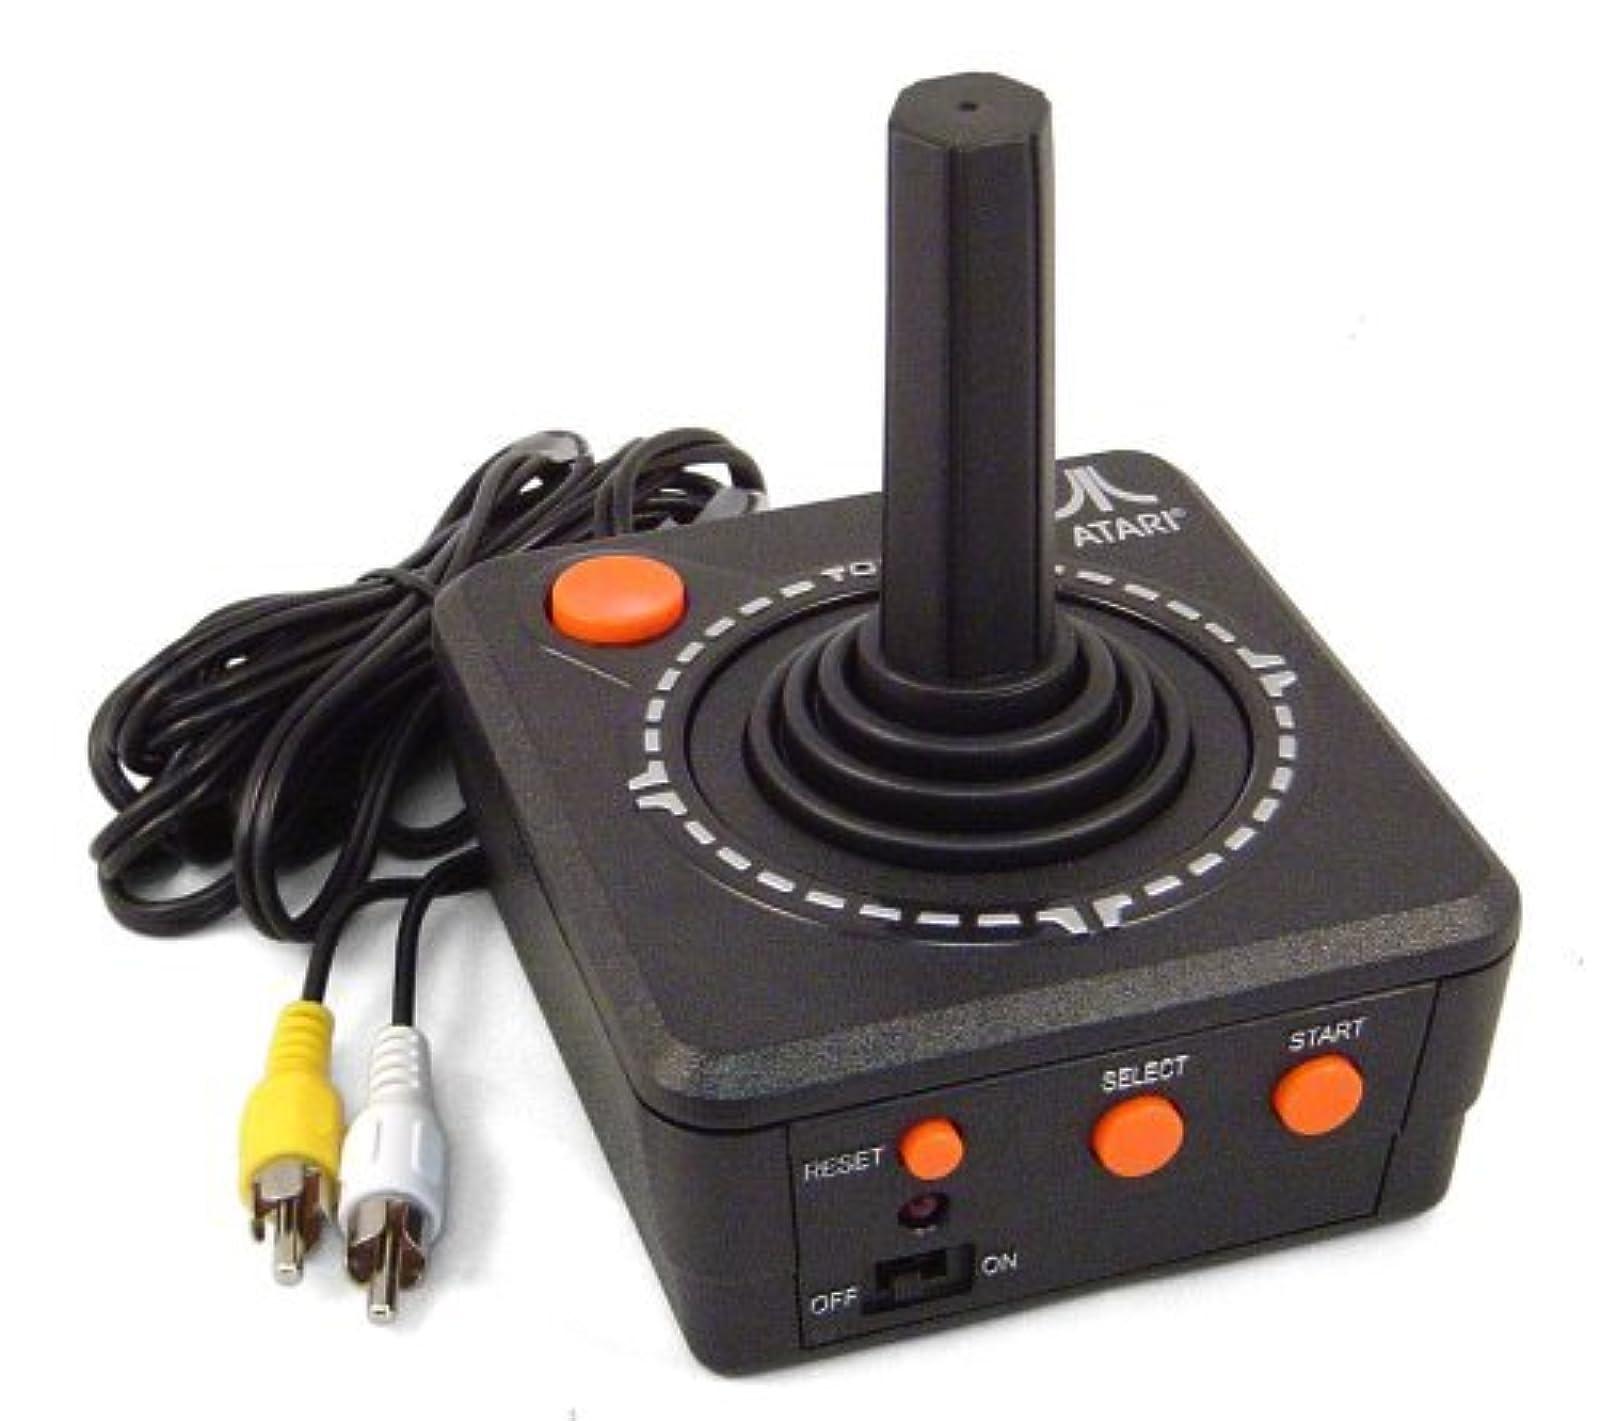 Atari Plug And Play TV Game Console Black Home COC180